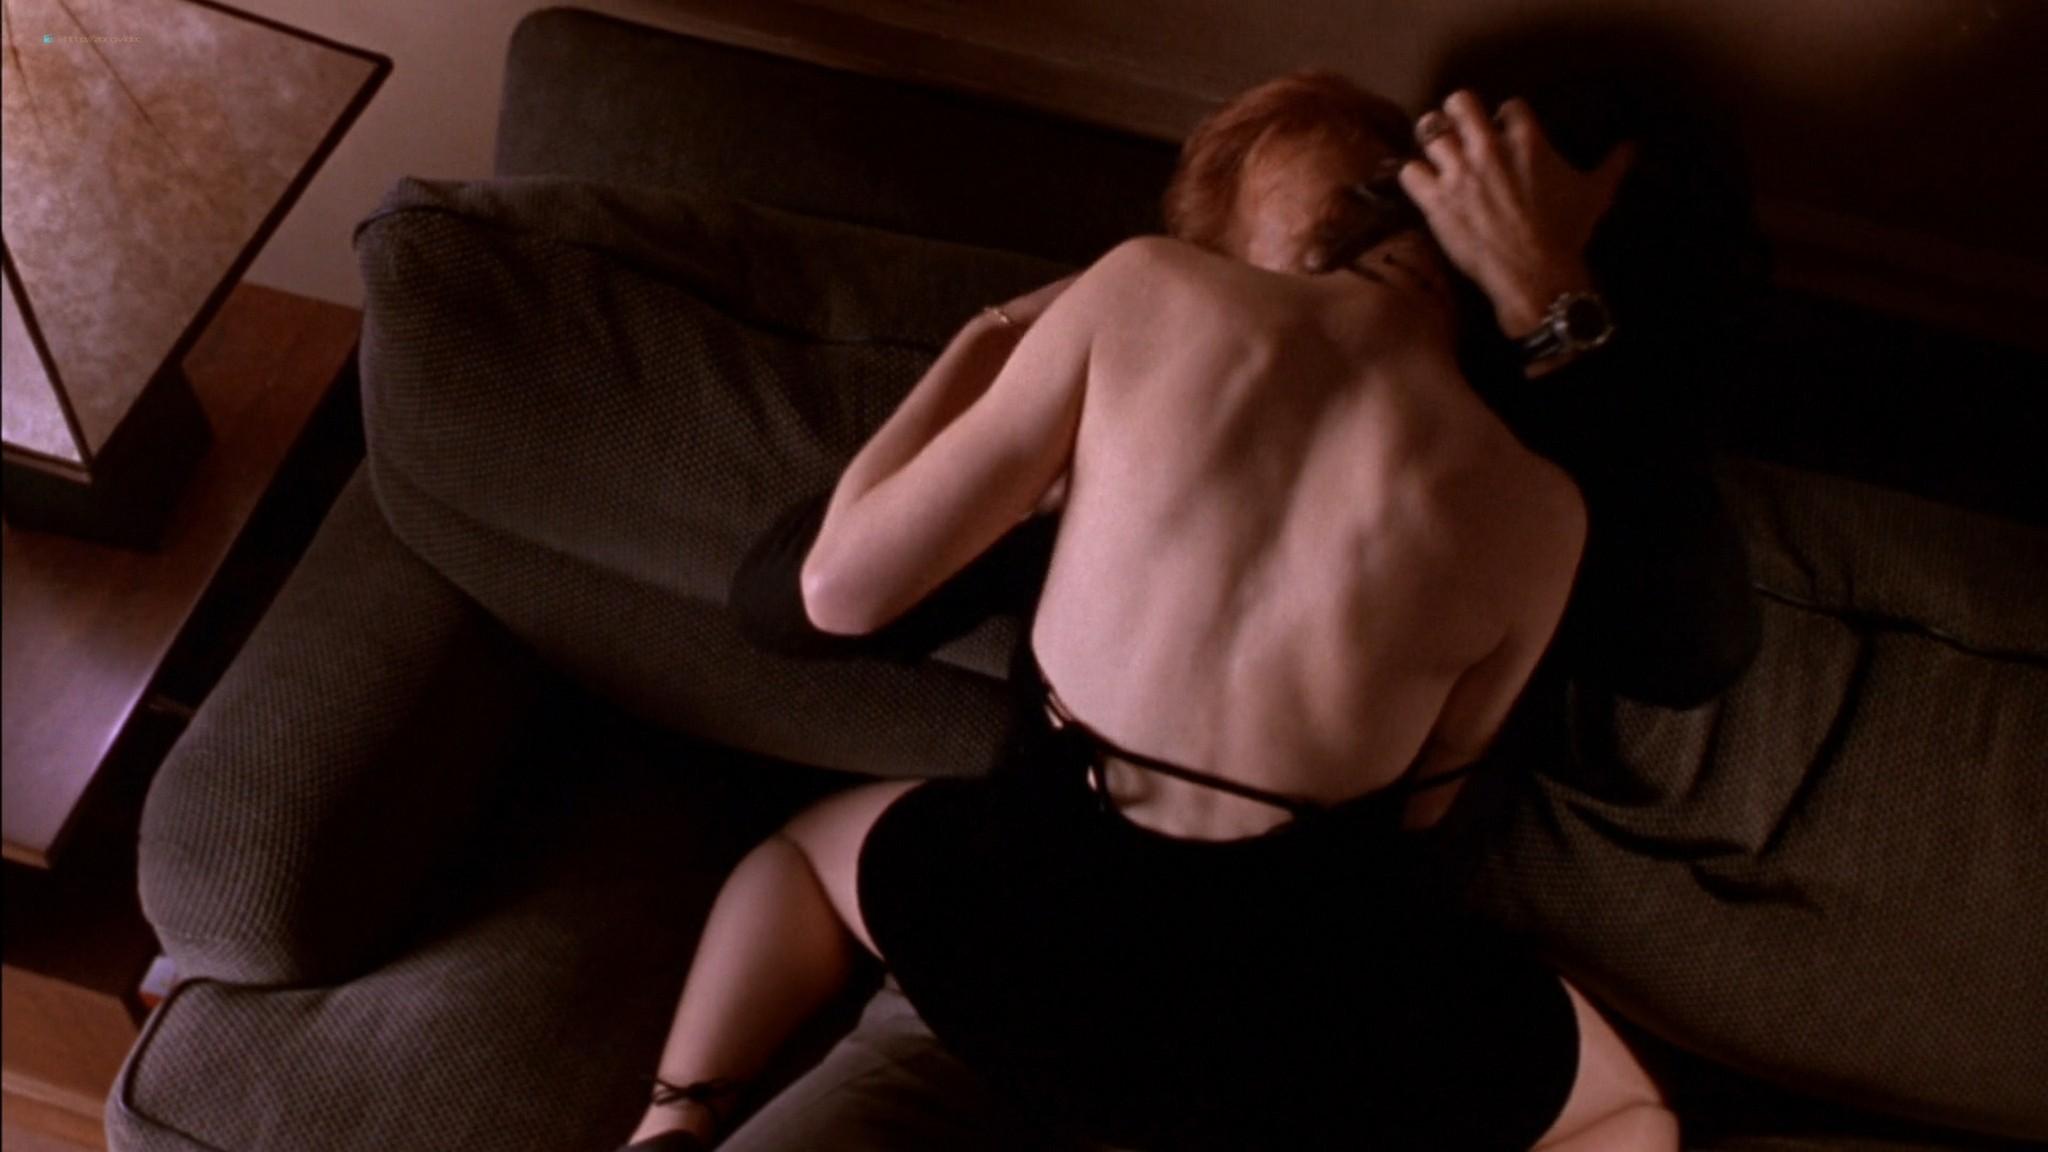 Linda Fiorentino nude Angie Everhart nude full frontal - Jade (1995) HD 1080p BluRay (7)